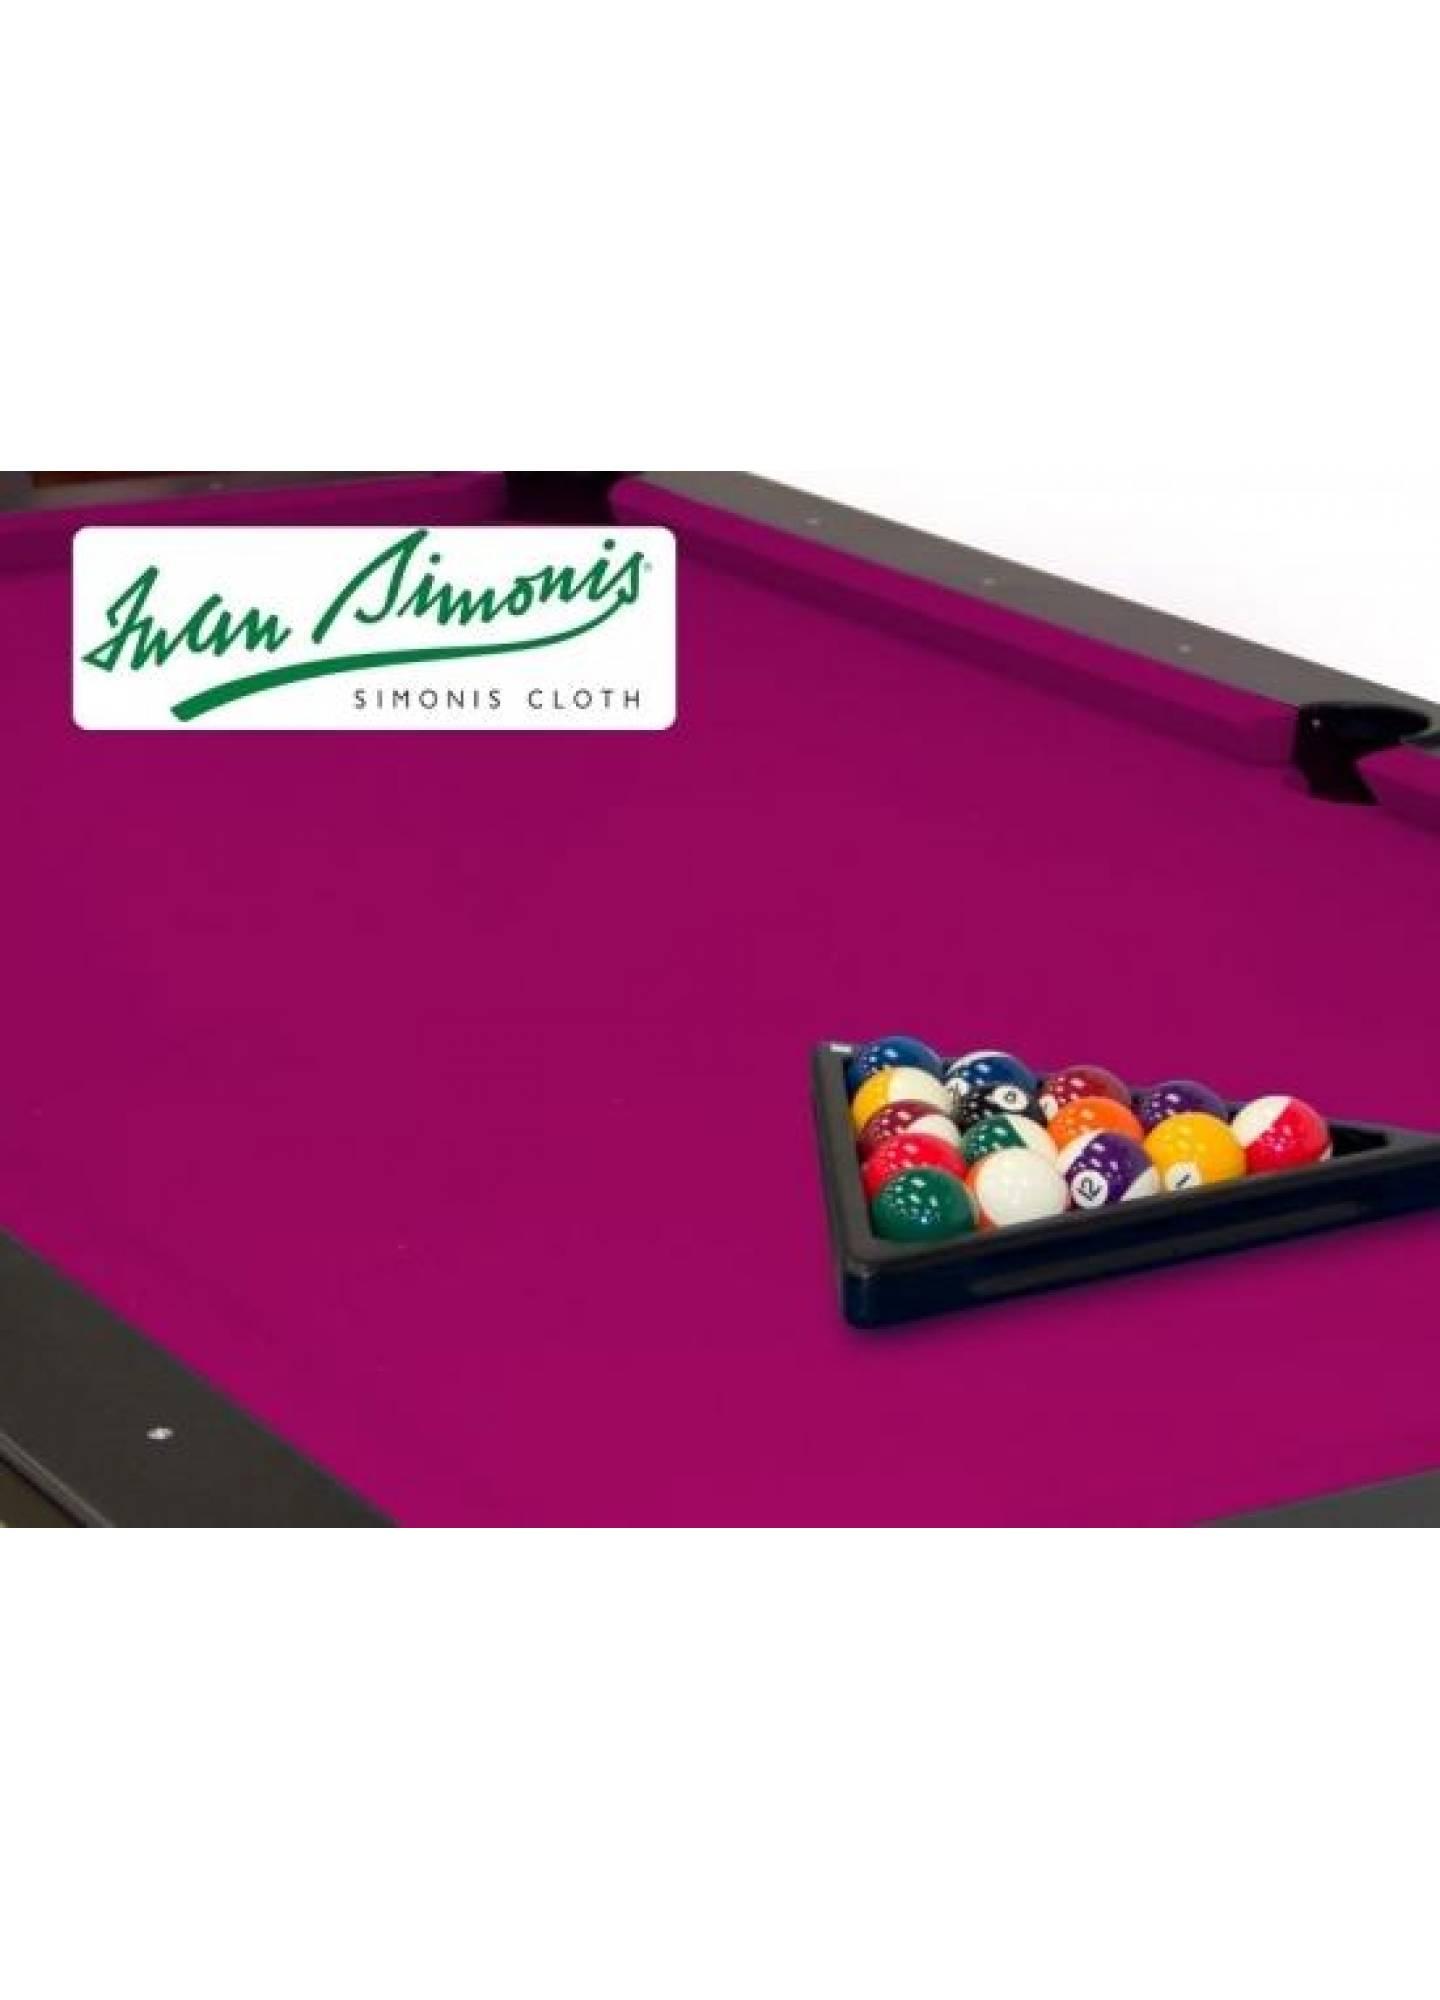 SIMONIS 760 FUCHSIA 9FT POOL TABLE CLOTH